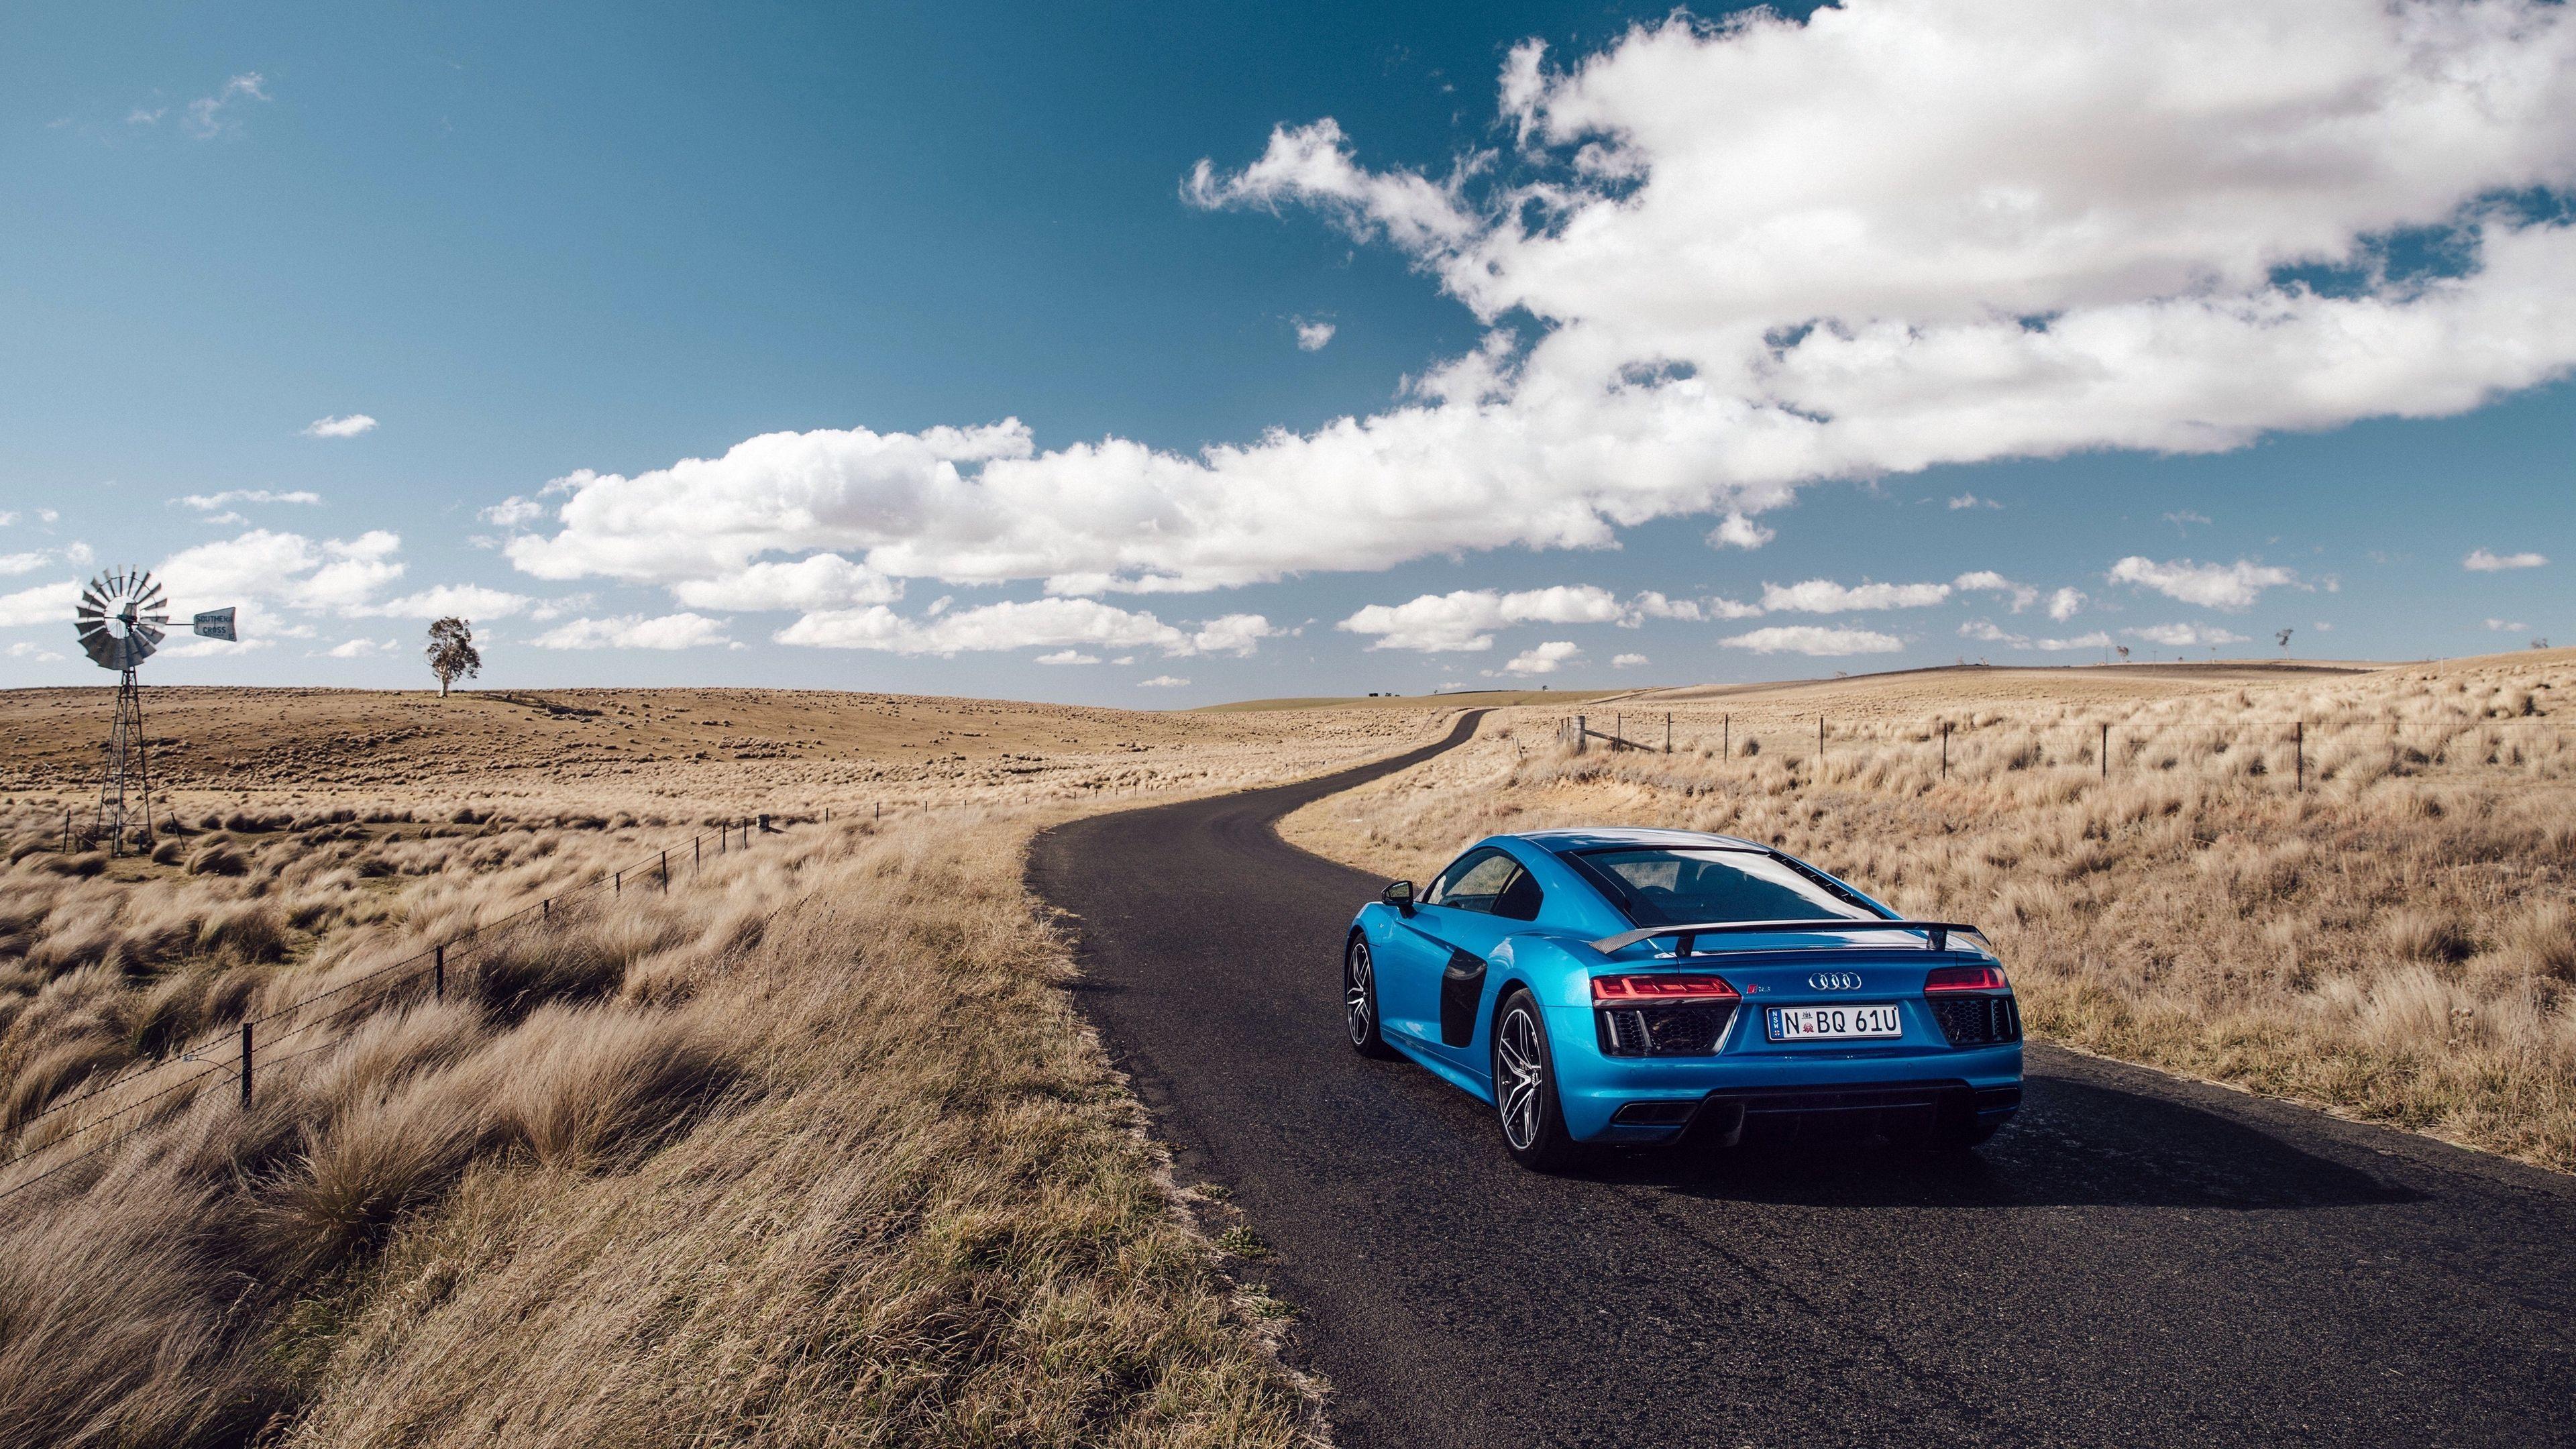 audi r8 v10 side view blue road grass 4k V10 r8 Audi